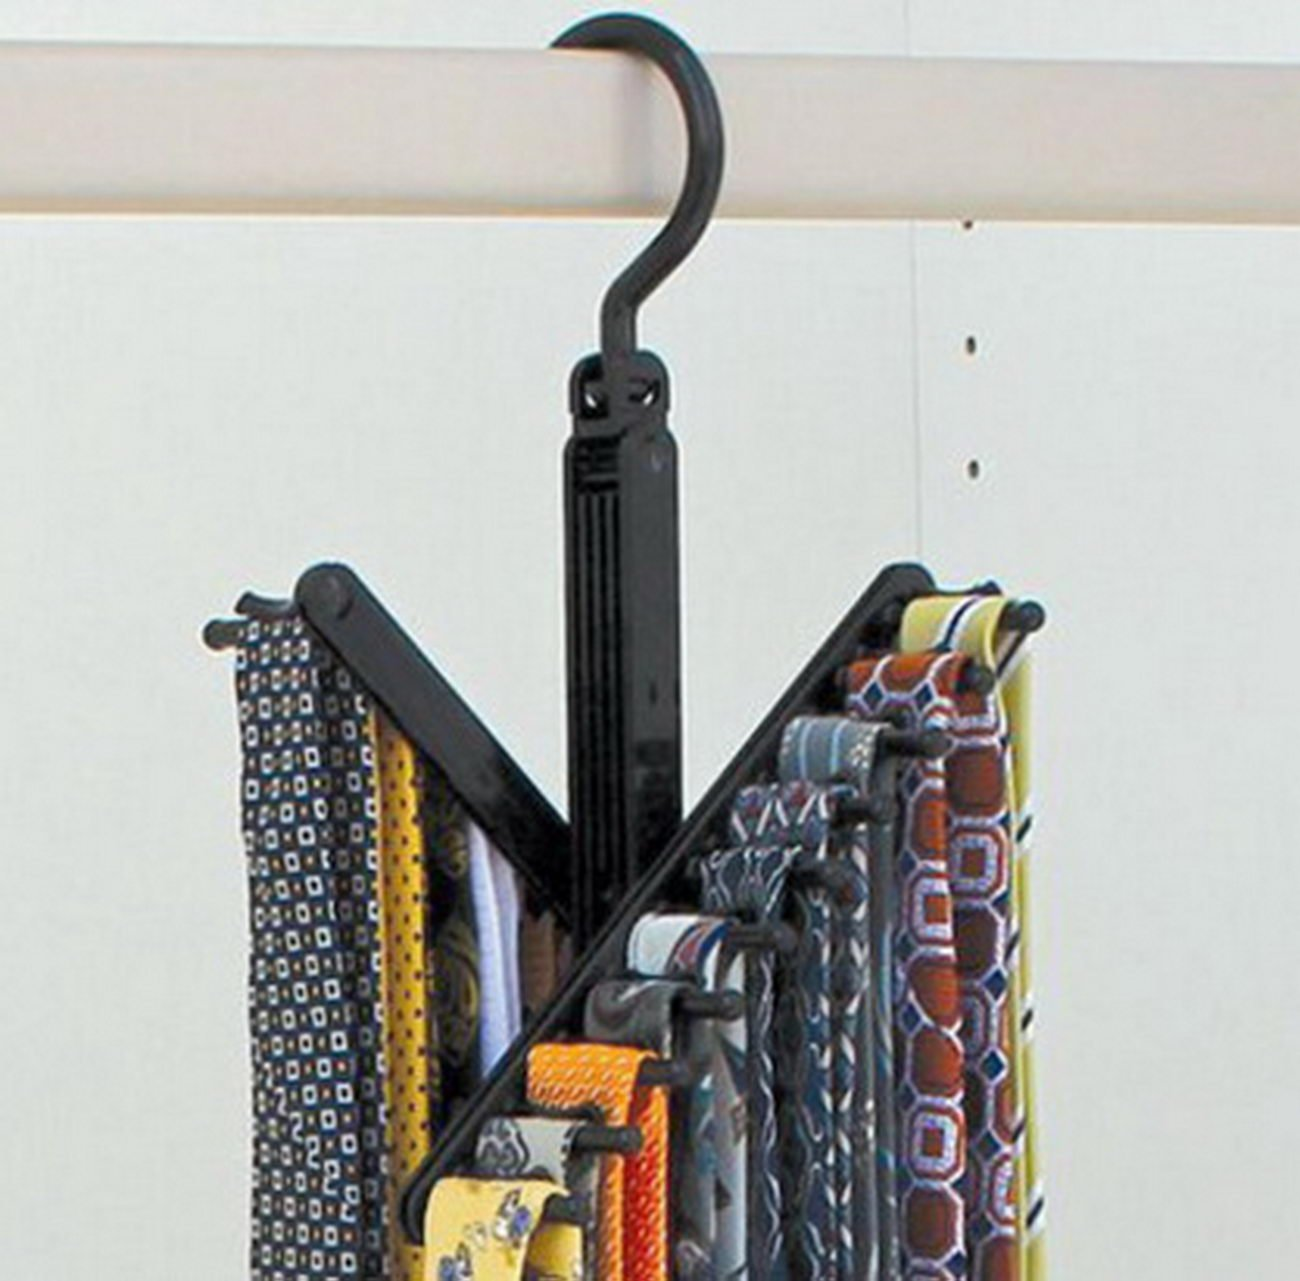 Donfohy Plastic Scarf Rack 606aad 20 Rows Tie